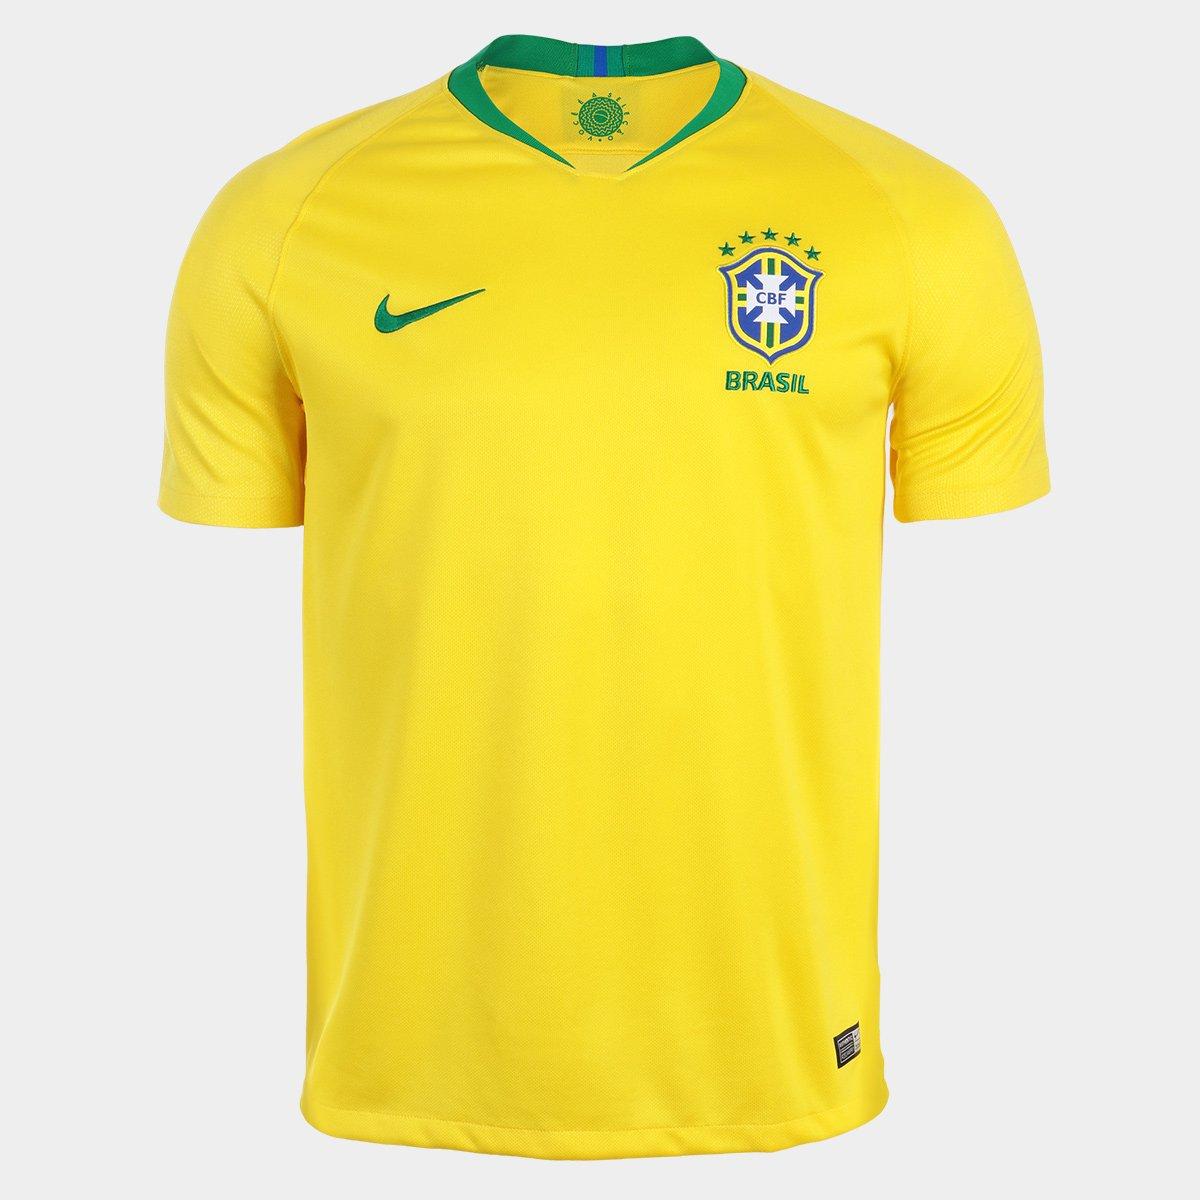 ... Camisa Seleção Brasil I 2018 nº 9 G. Jesus - Torcedor Nike Masculina ... 0d84436277